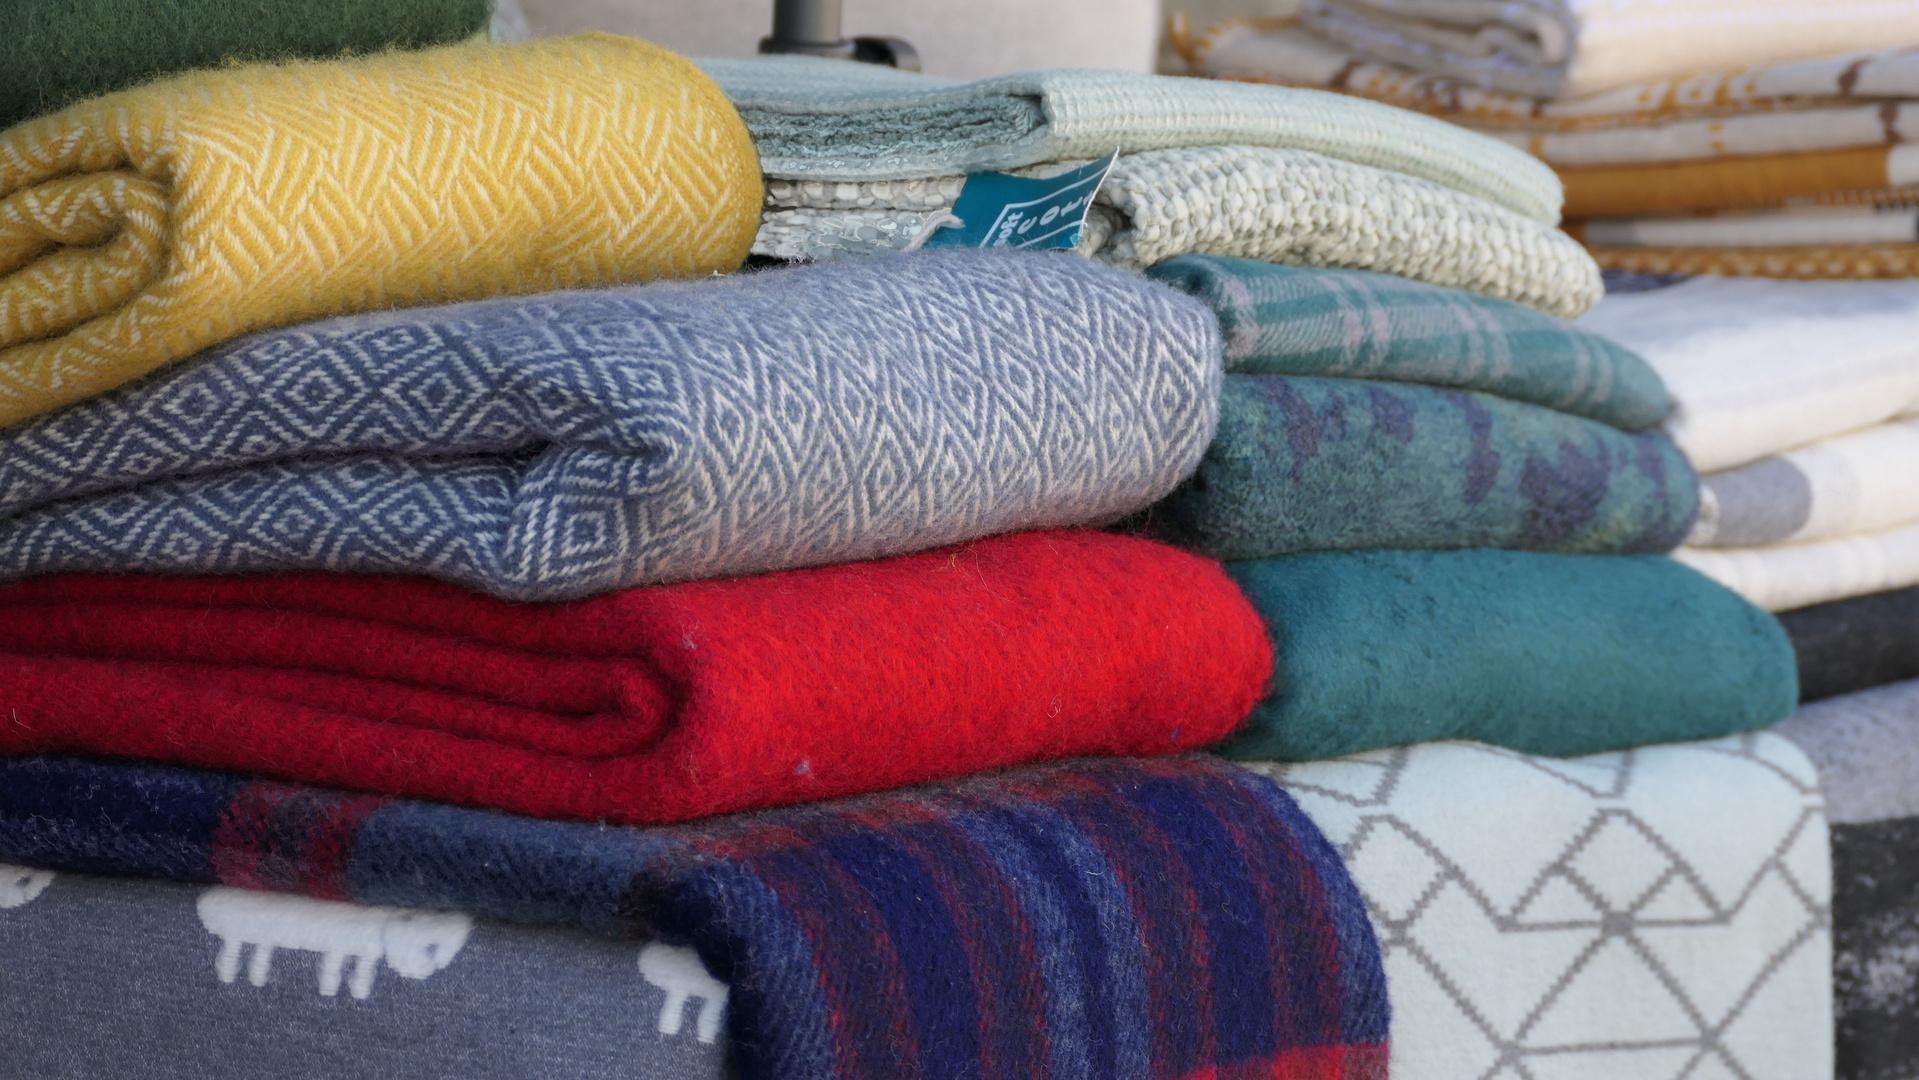 ... woolen blankets